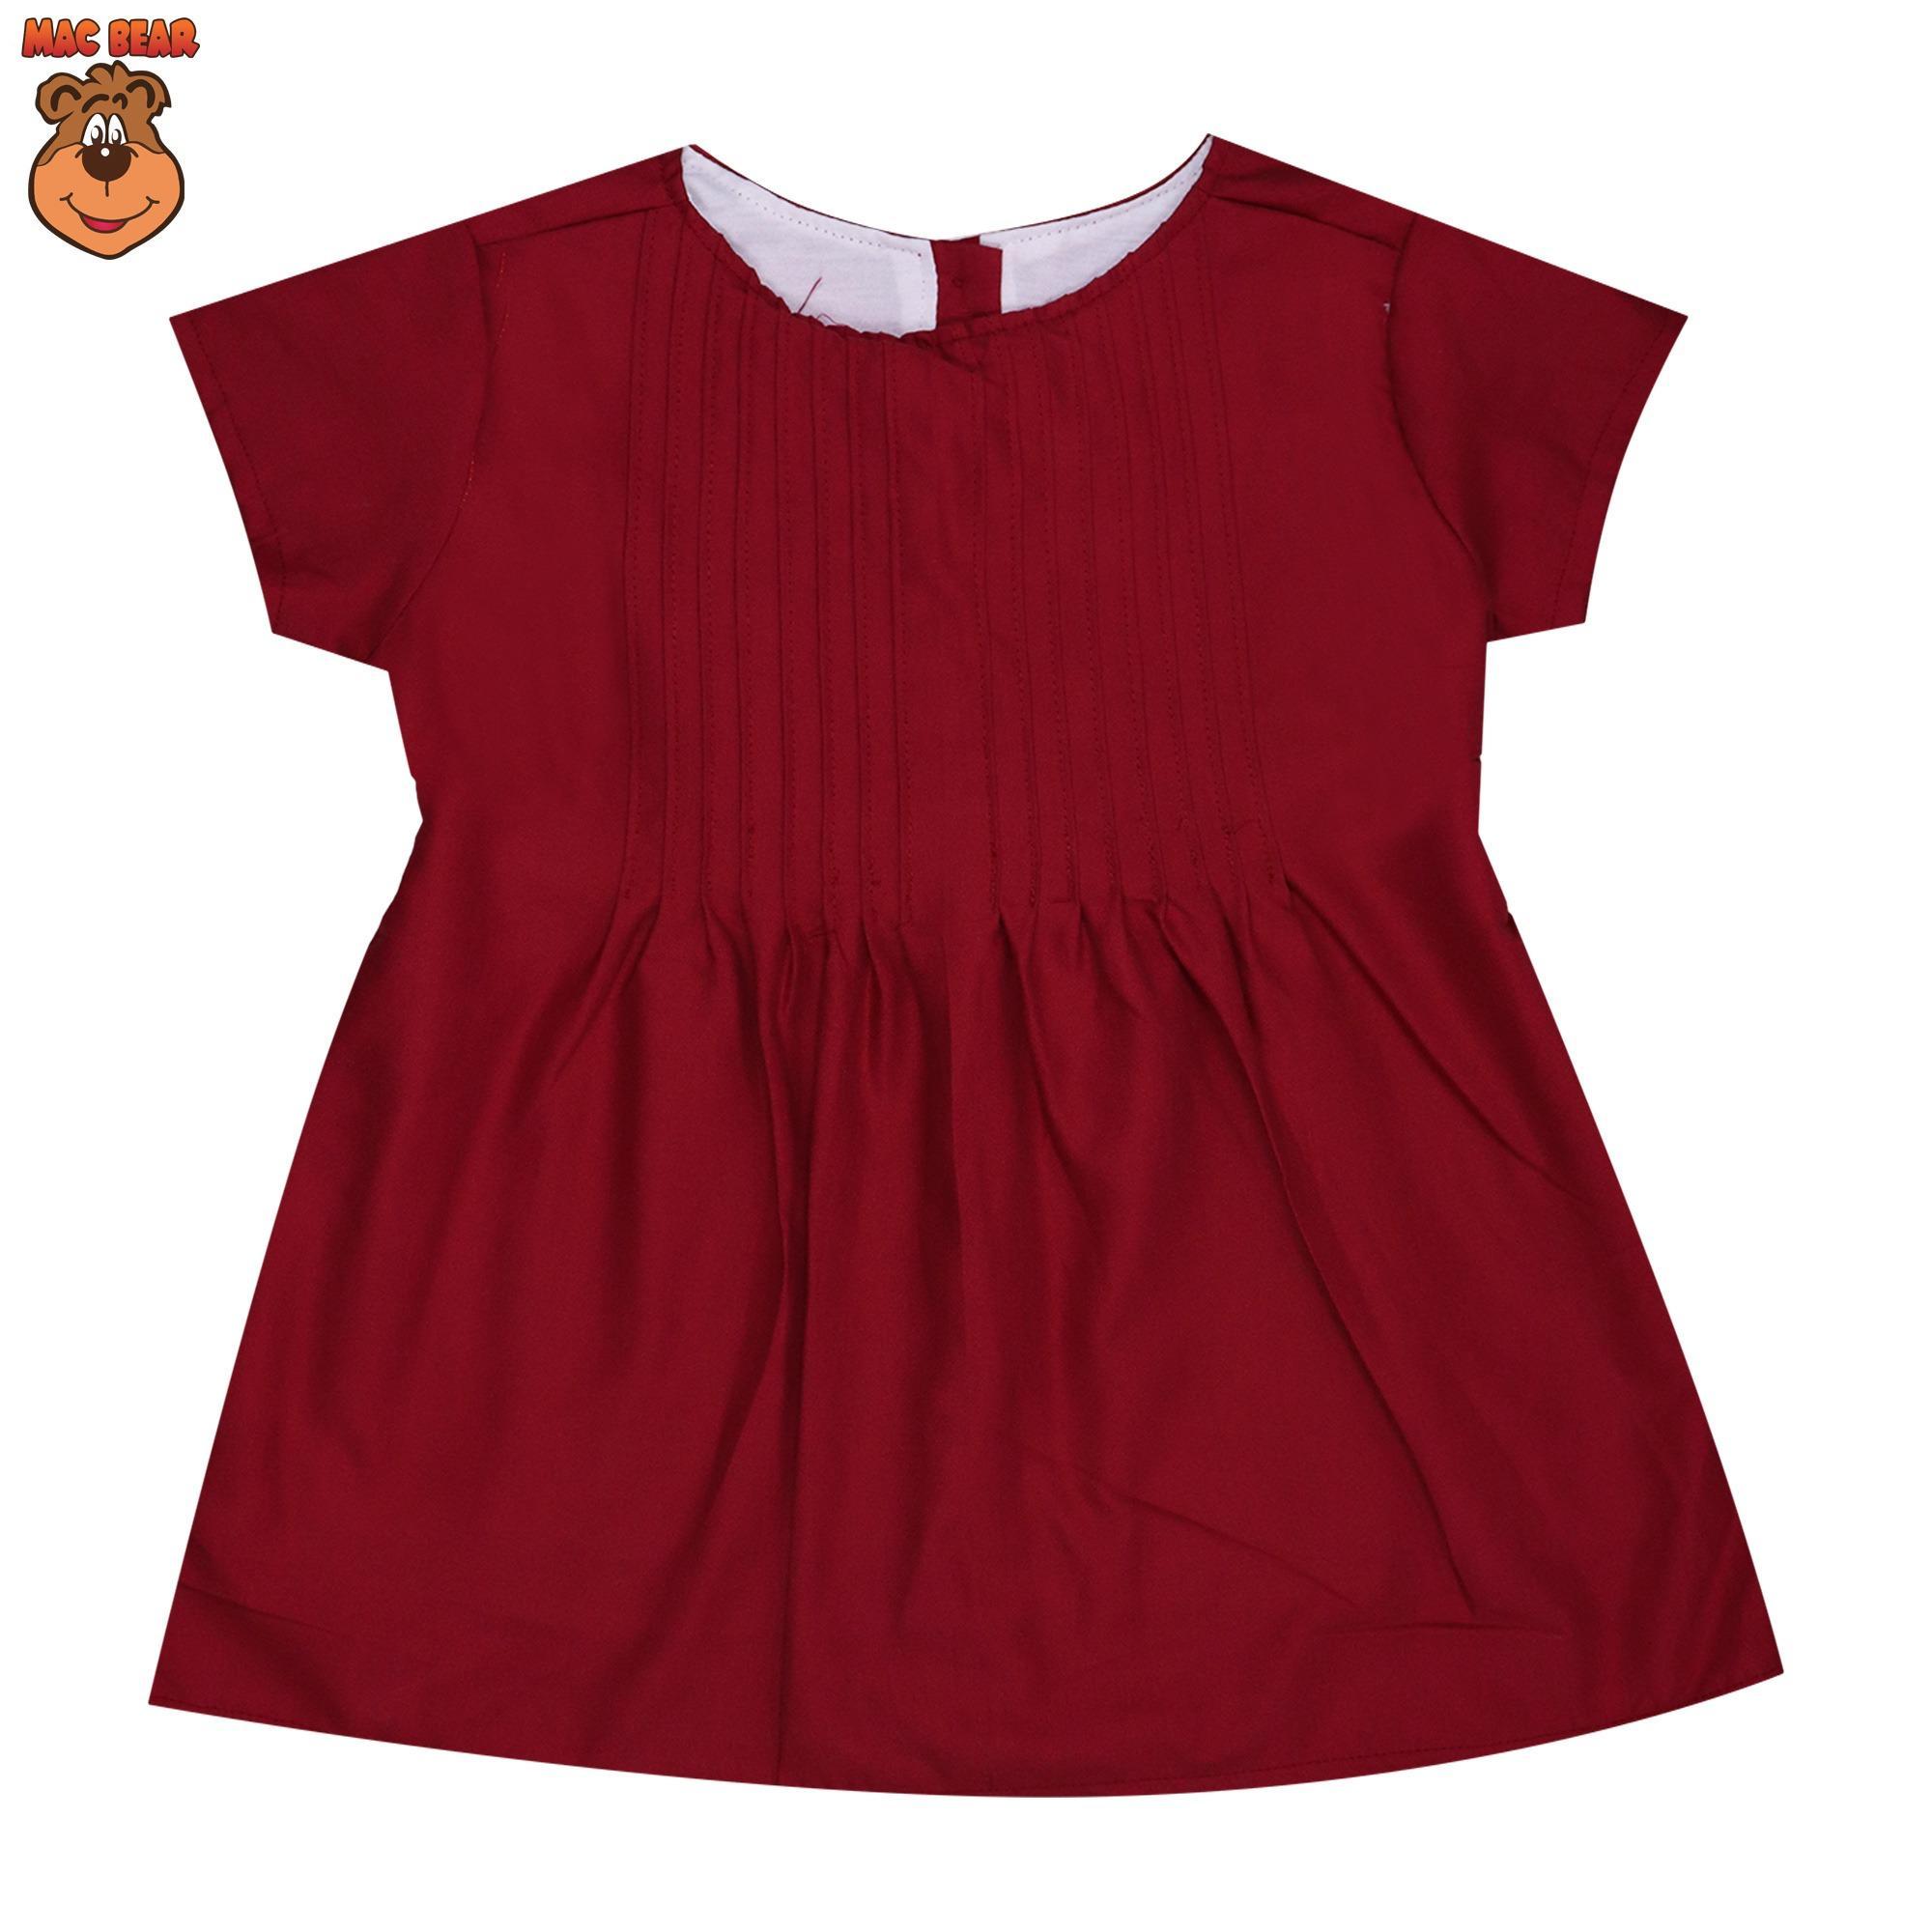 Macbear Baju Polo Anak M For White Stripes On Yellow Size 6 De5 1805 Junior Kemeja Lengan Panjang 3 Stars Blue 12 Biru Source